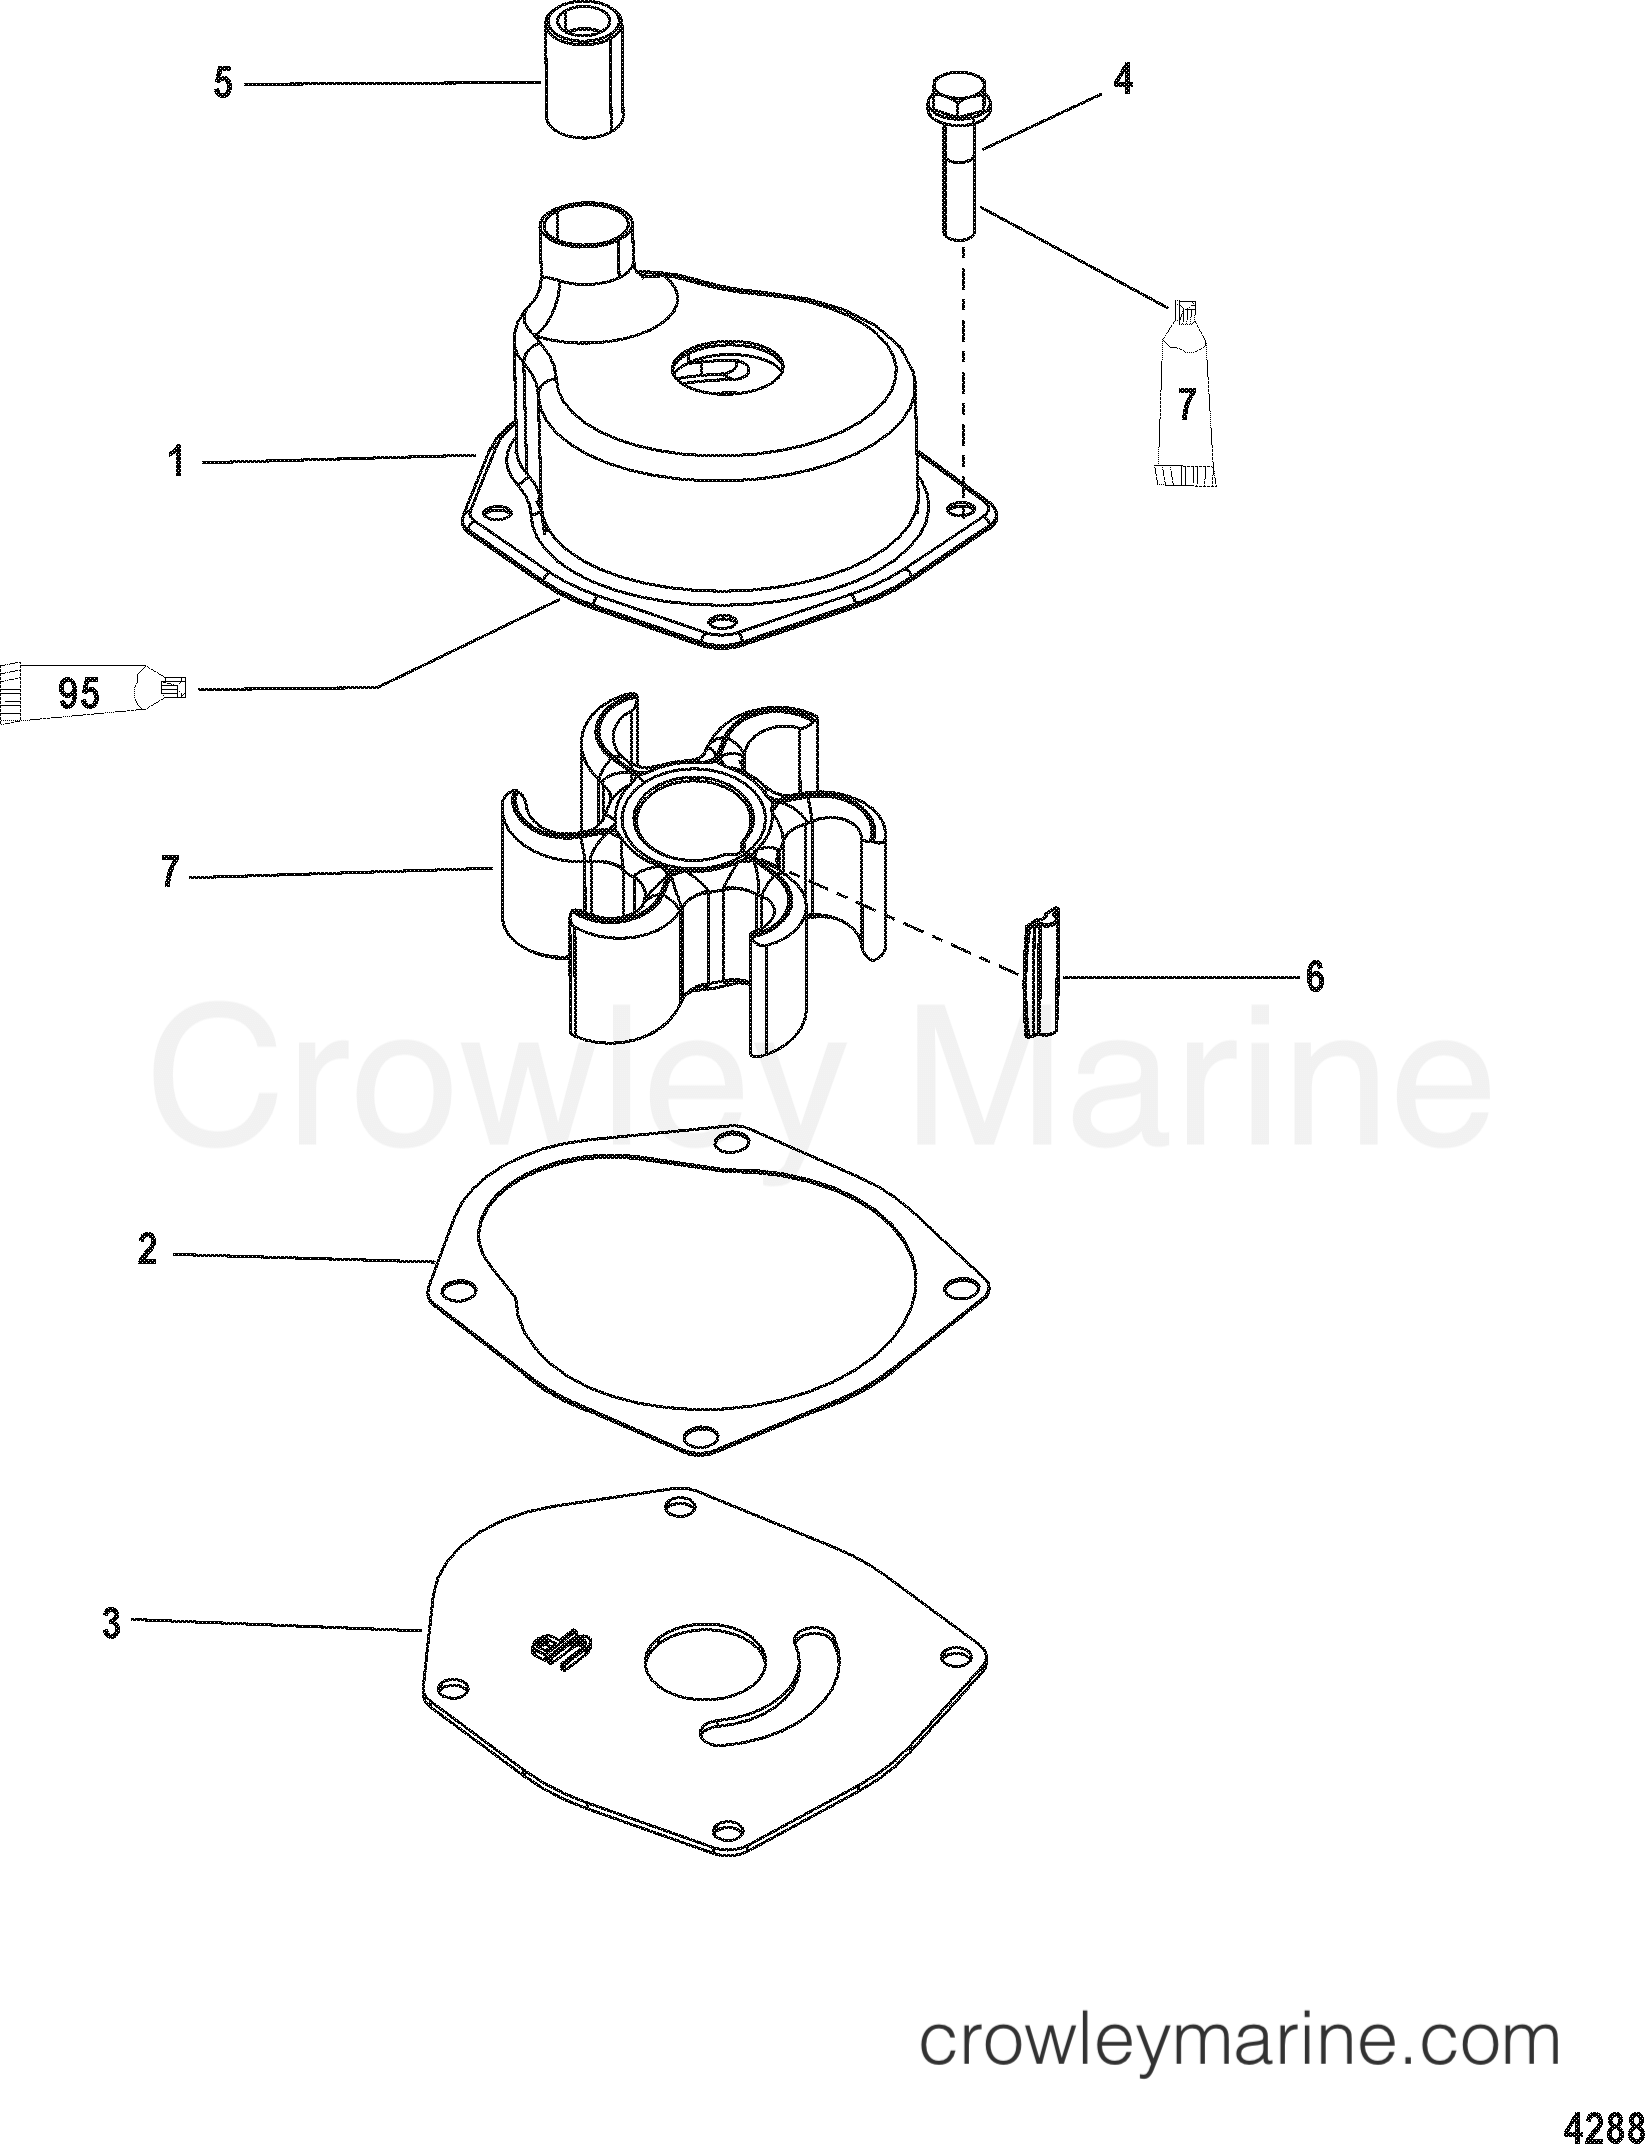 Jet Pump Components